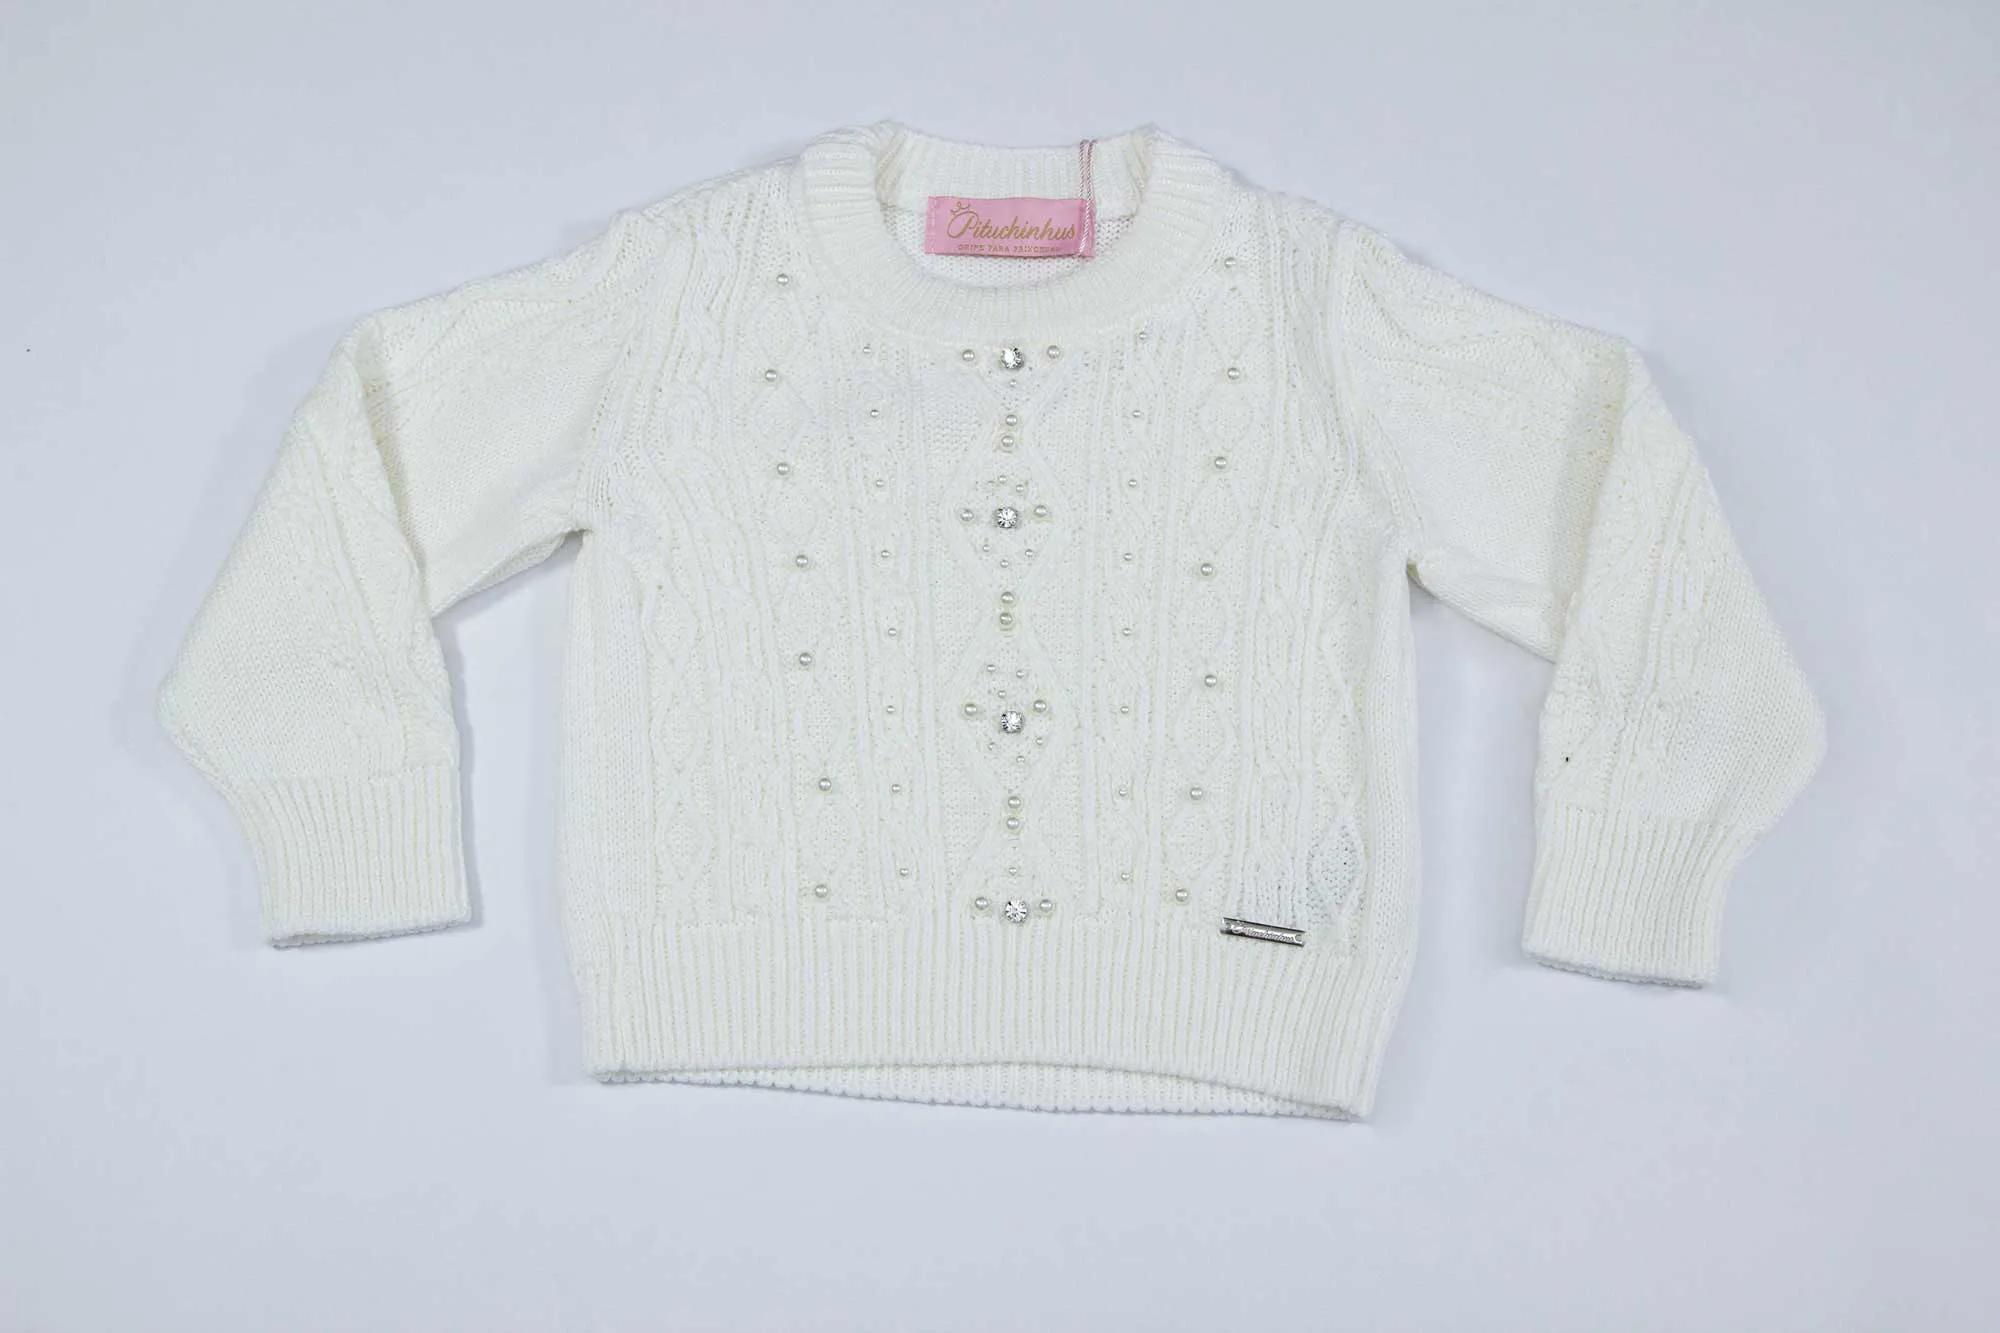 Blusa Tricot Tranças Bordados Pituchinhus Premium